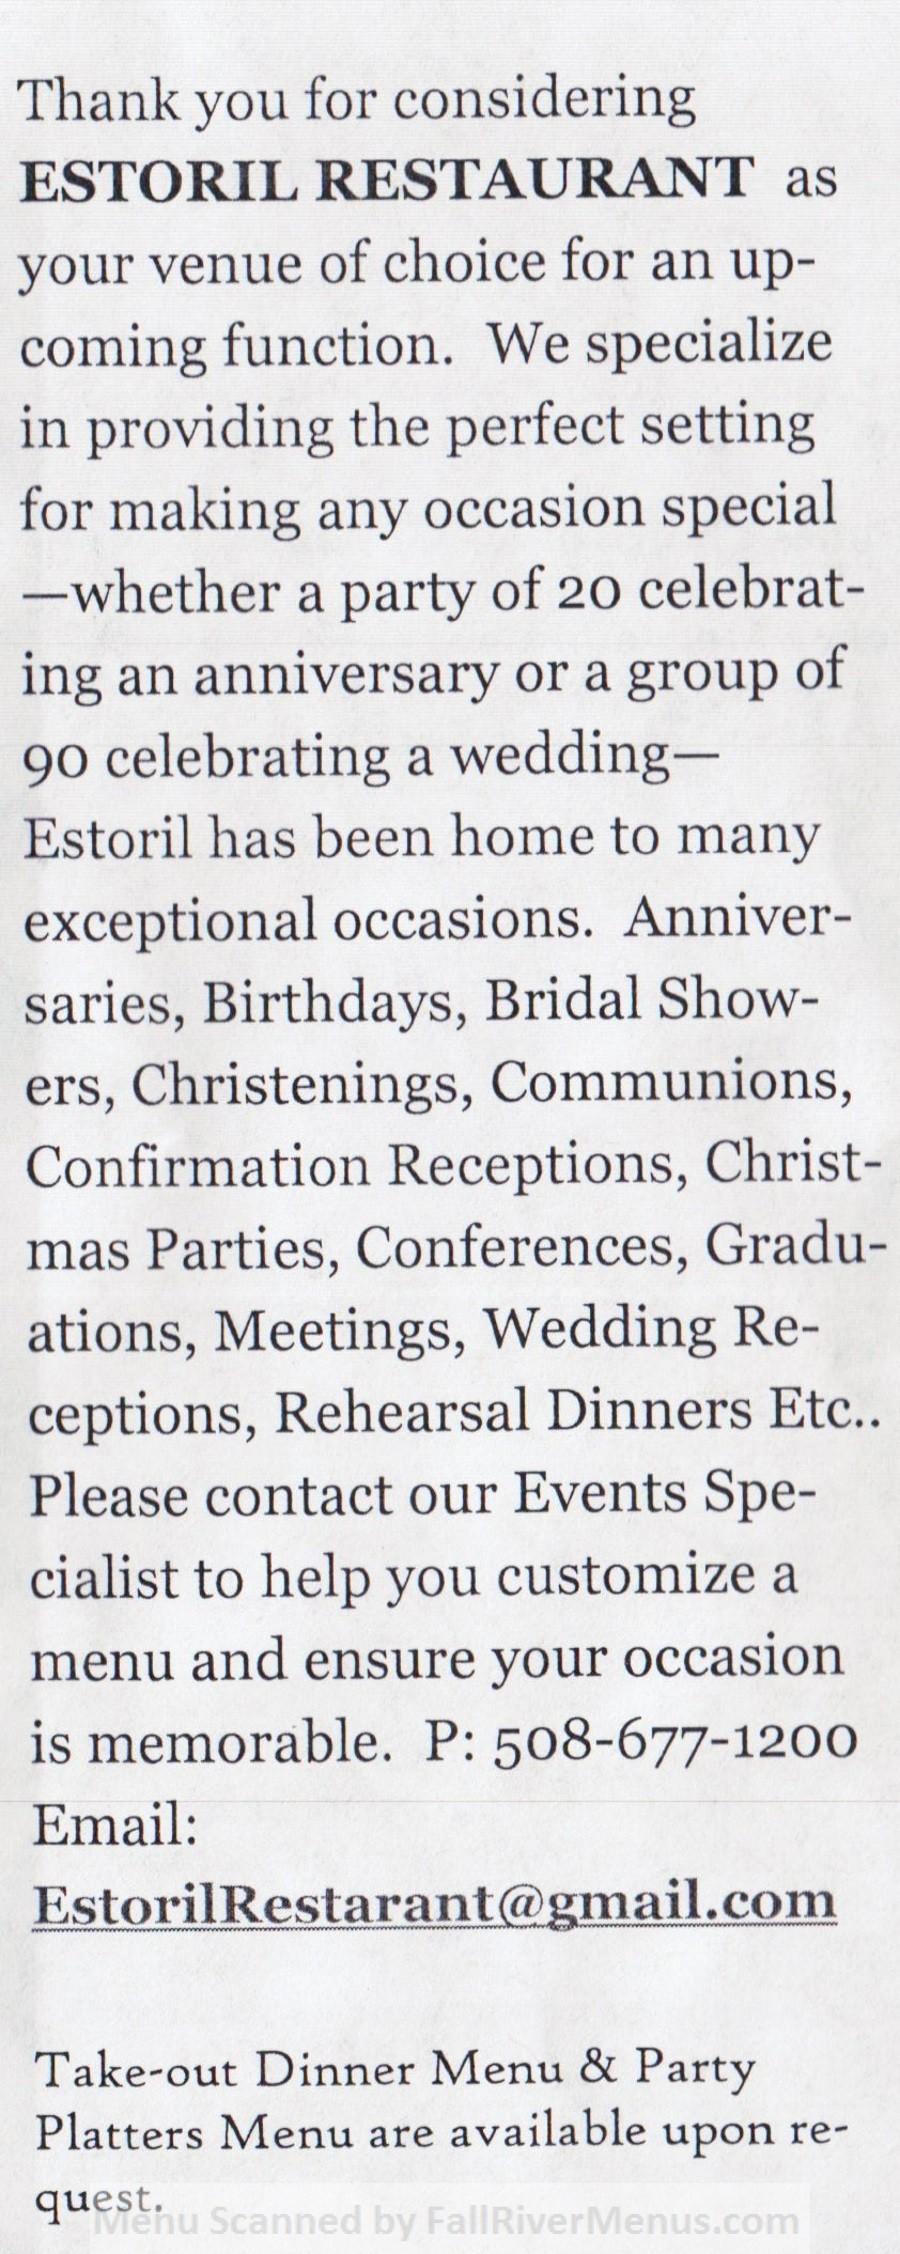 estoril restaurant 5 scnd 5-15-2016